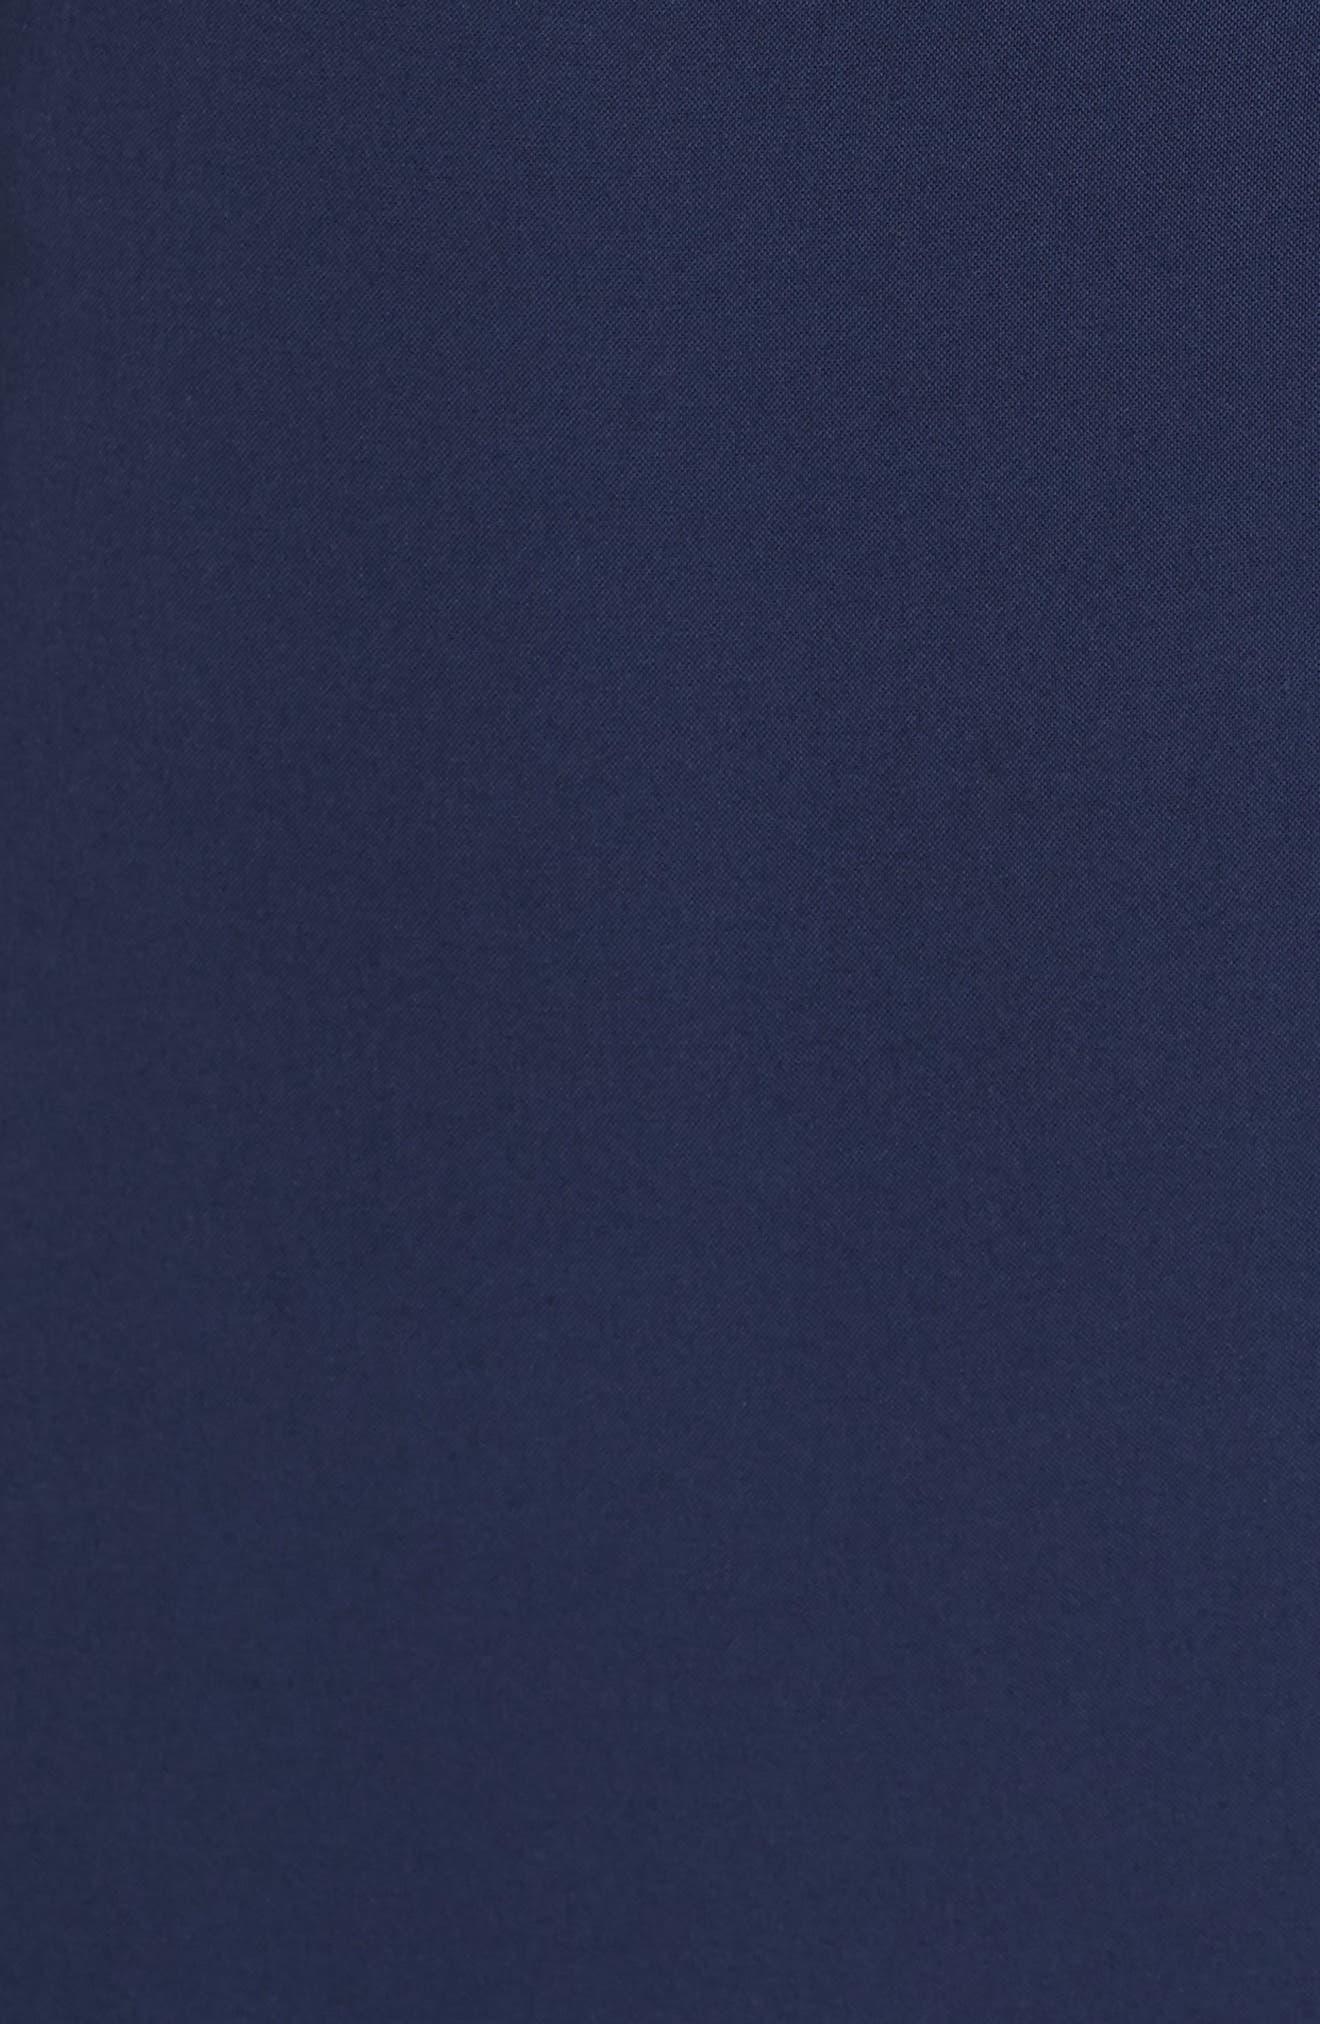 Goa Cover-Up Maxi Wrap Dress,                             Alternate thumbnail 5, color,                             MIDNIGHT BLUE